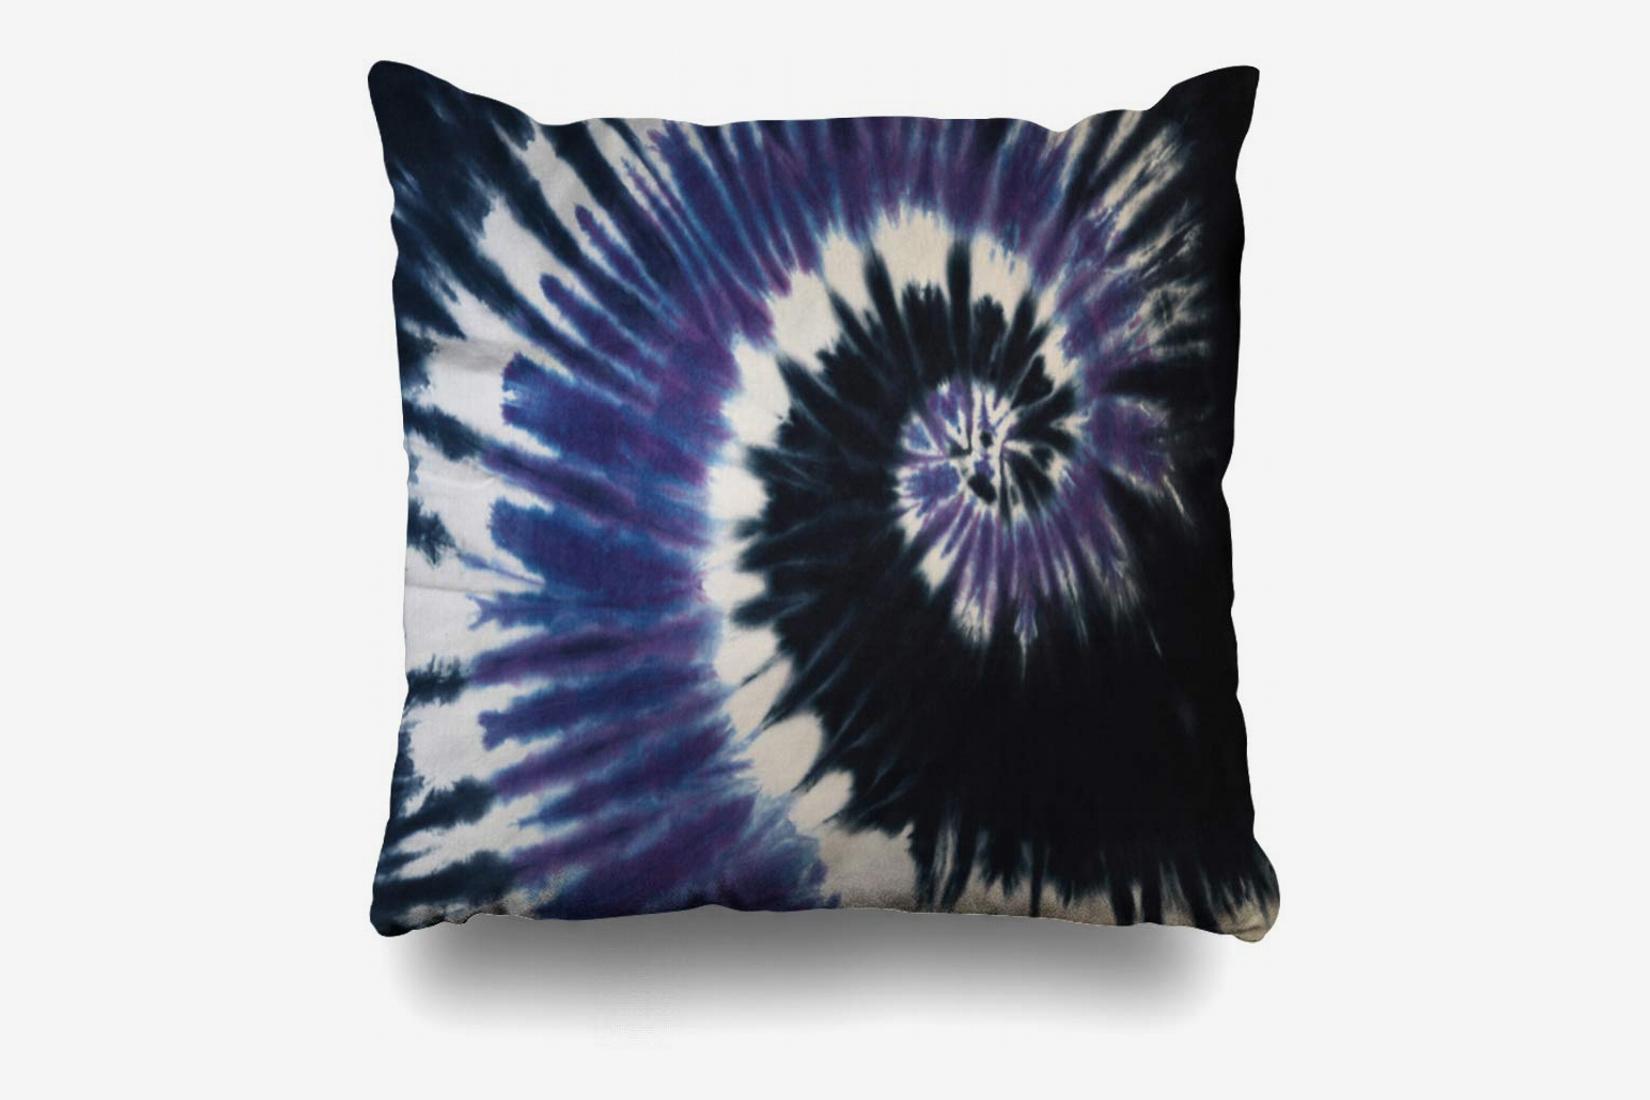 Ahawoso Throw Pillow Cover Blue Black Tie Dye